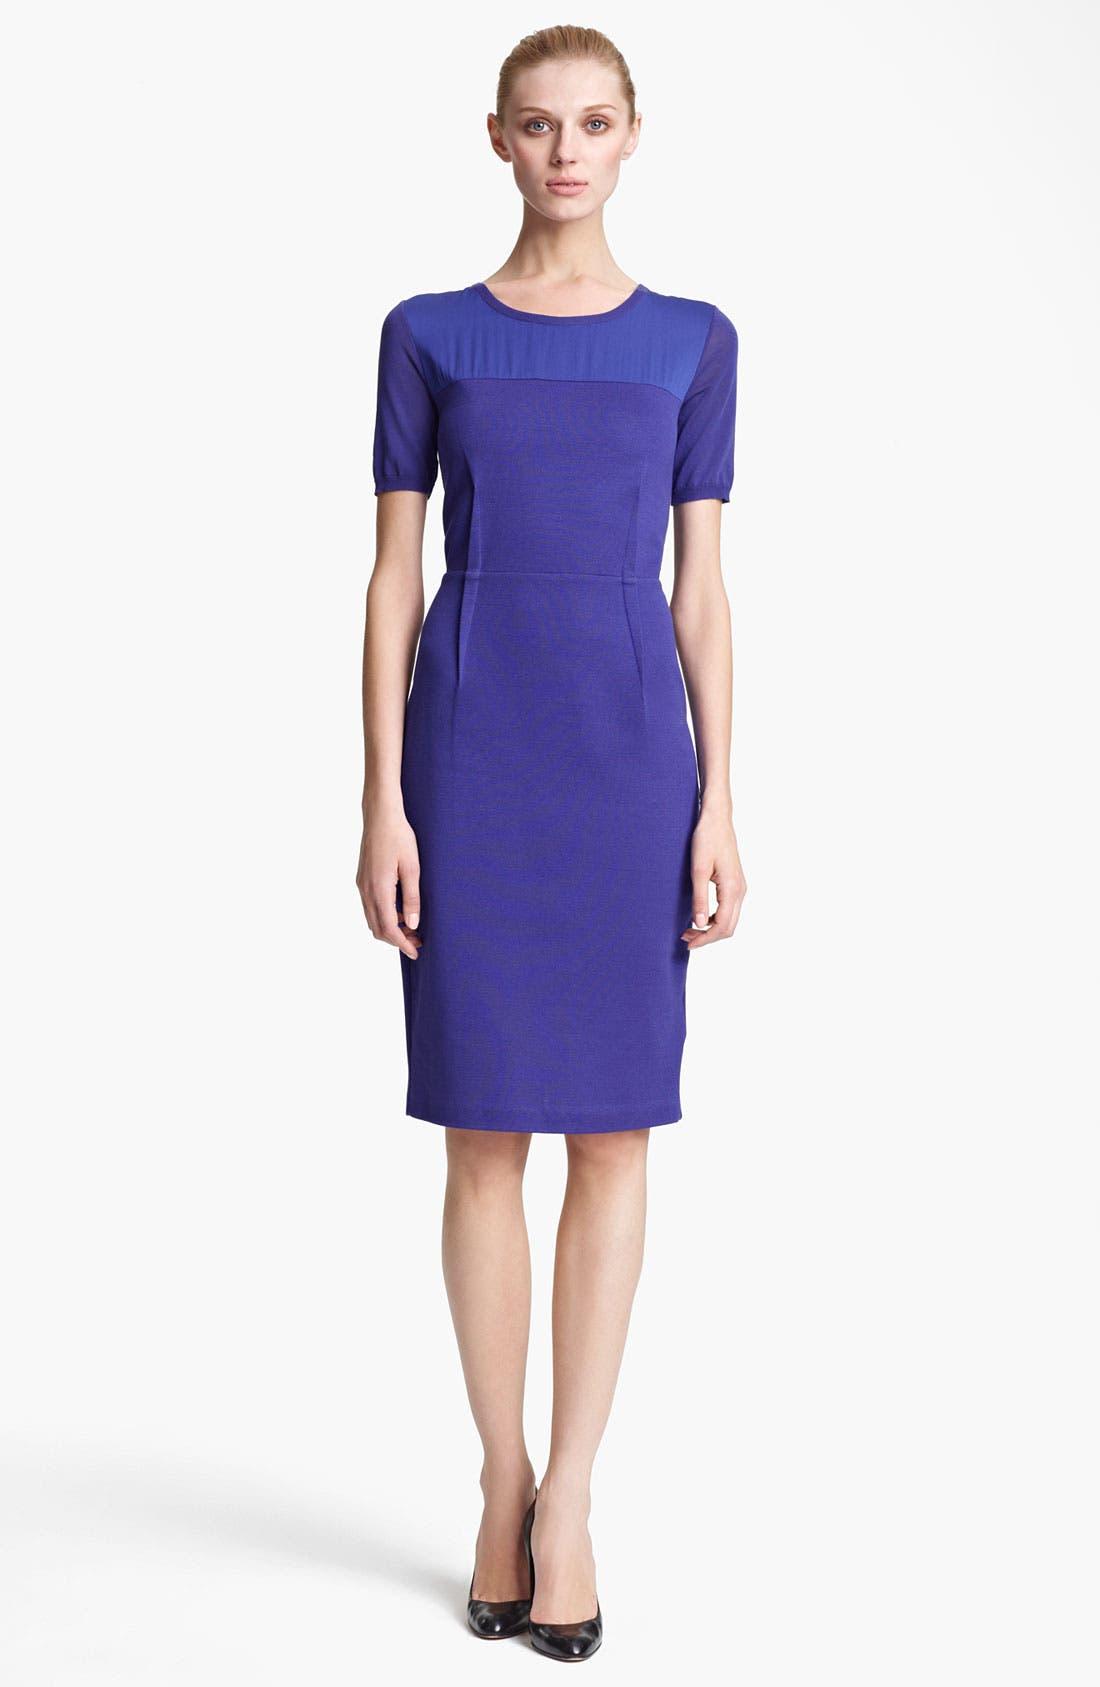 Main Image - Max Mara Techno Knit & Jersey Dress